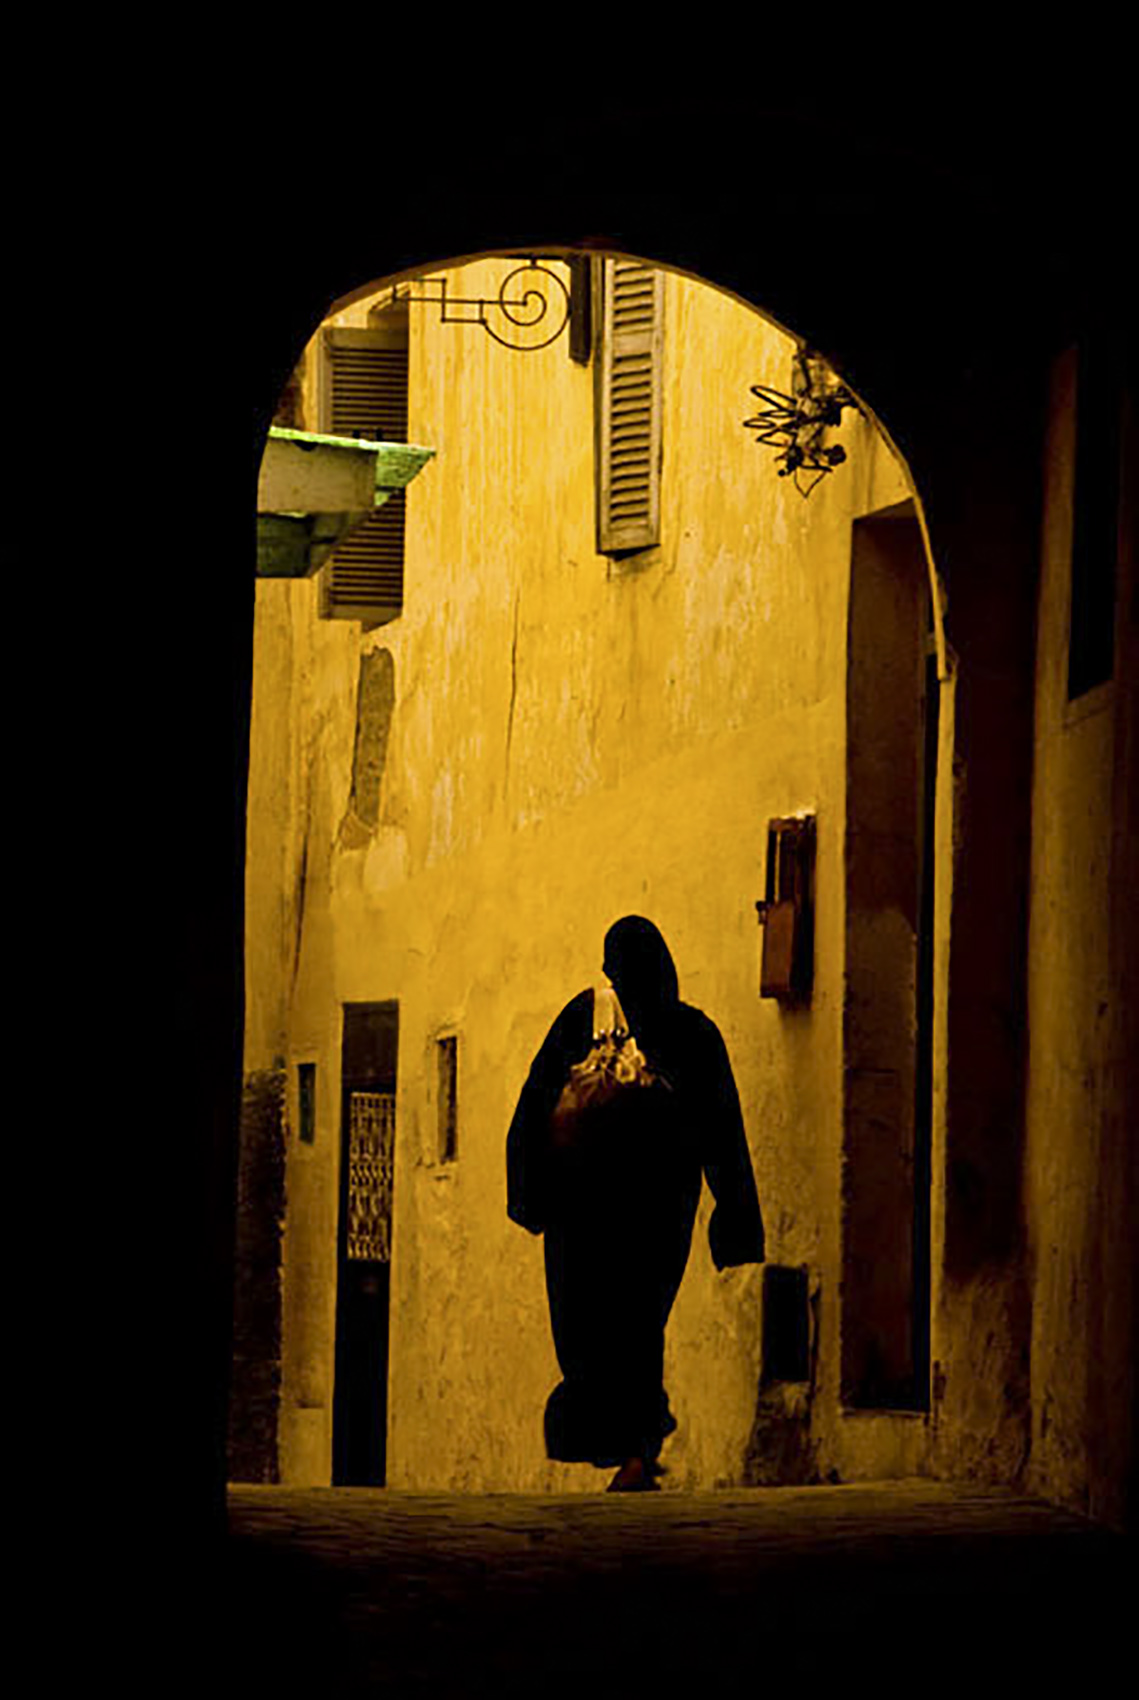 Alleyway, Tangier